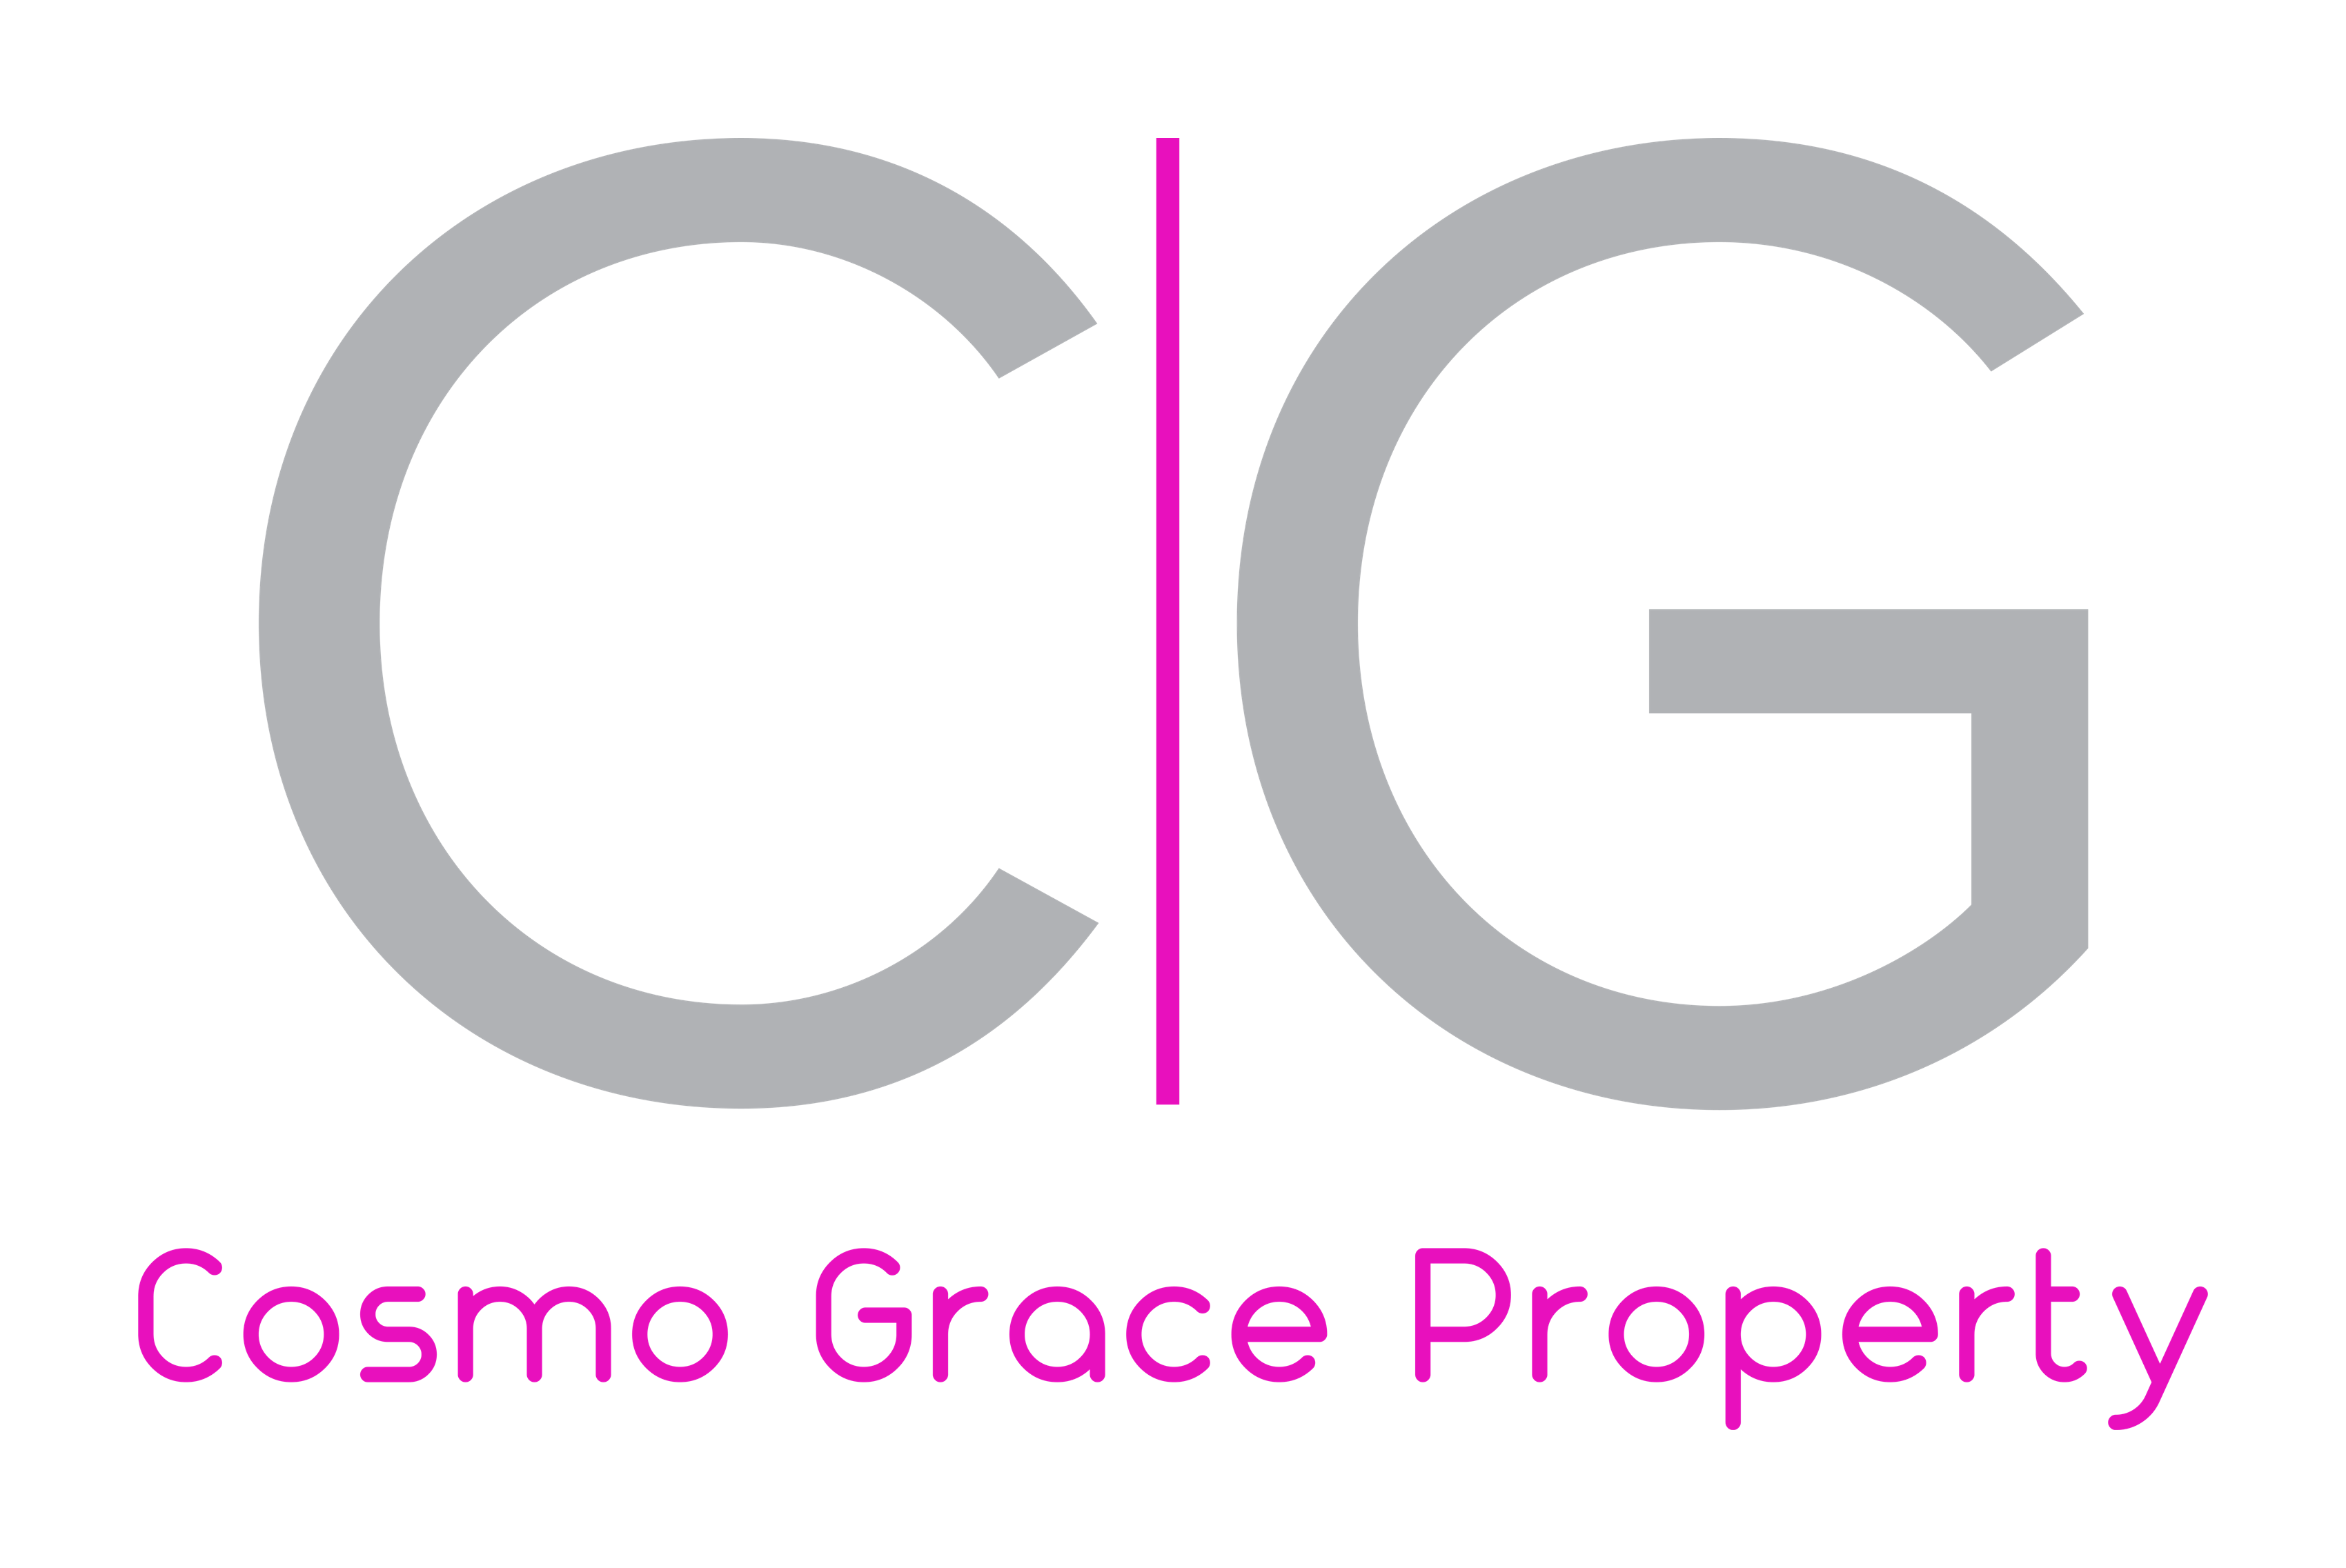 Cosmo Grace